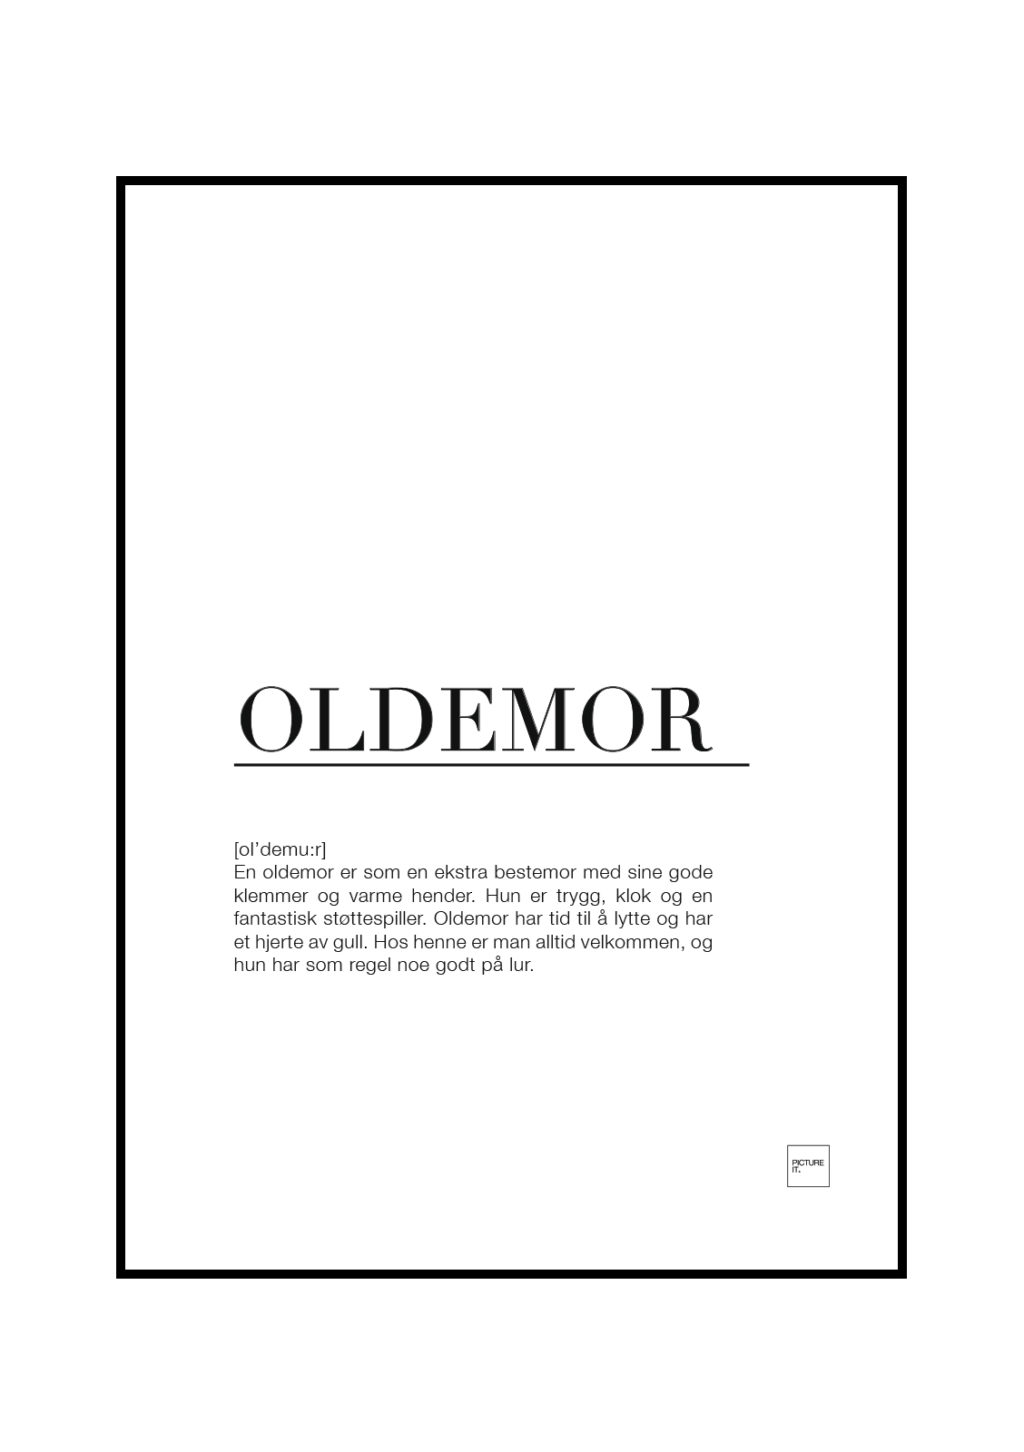 oldemor poster